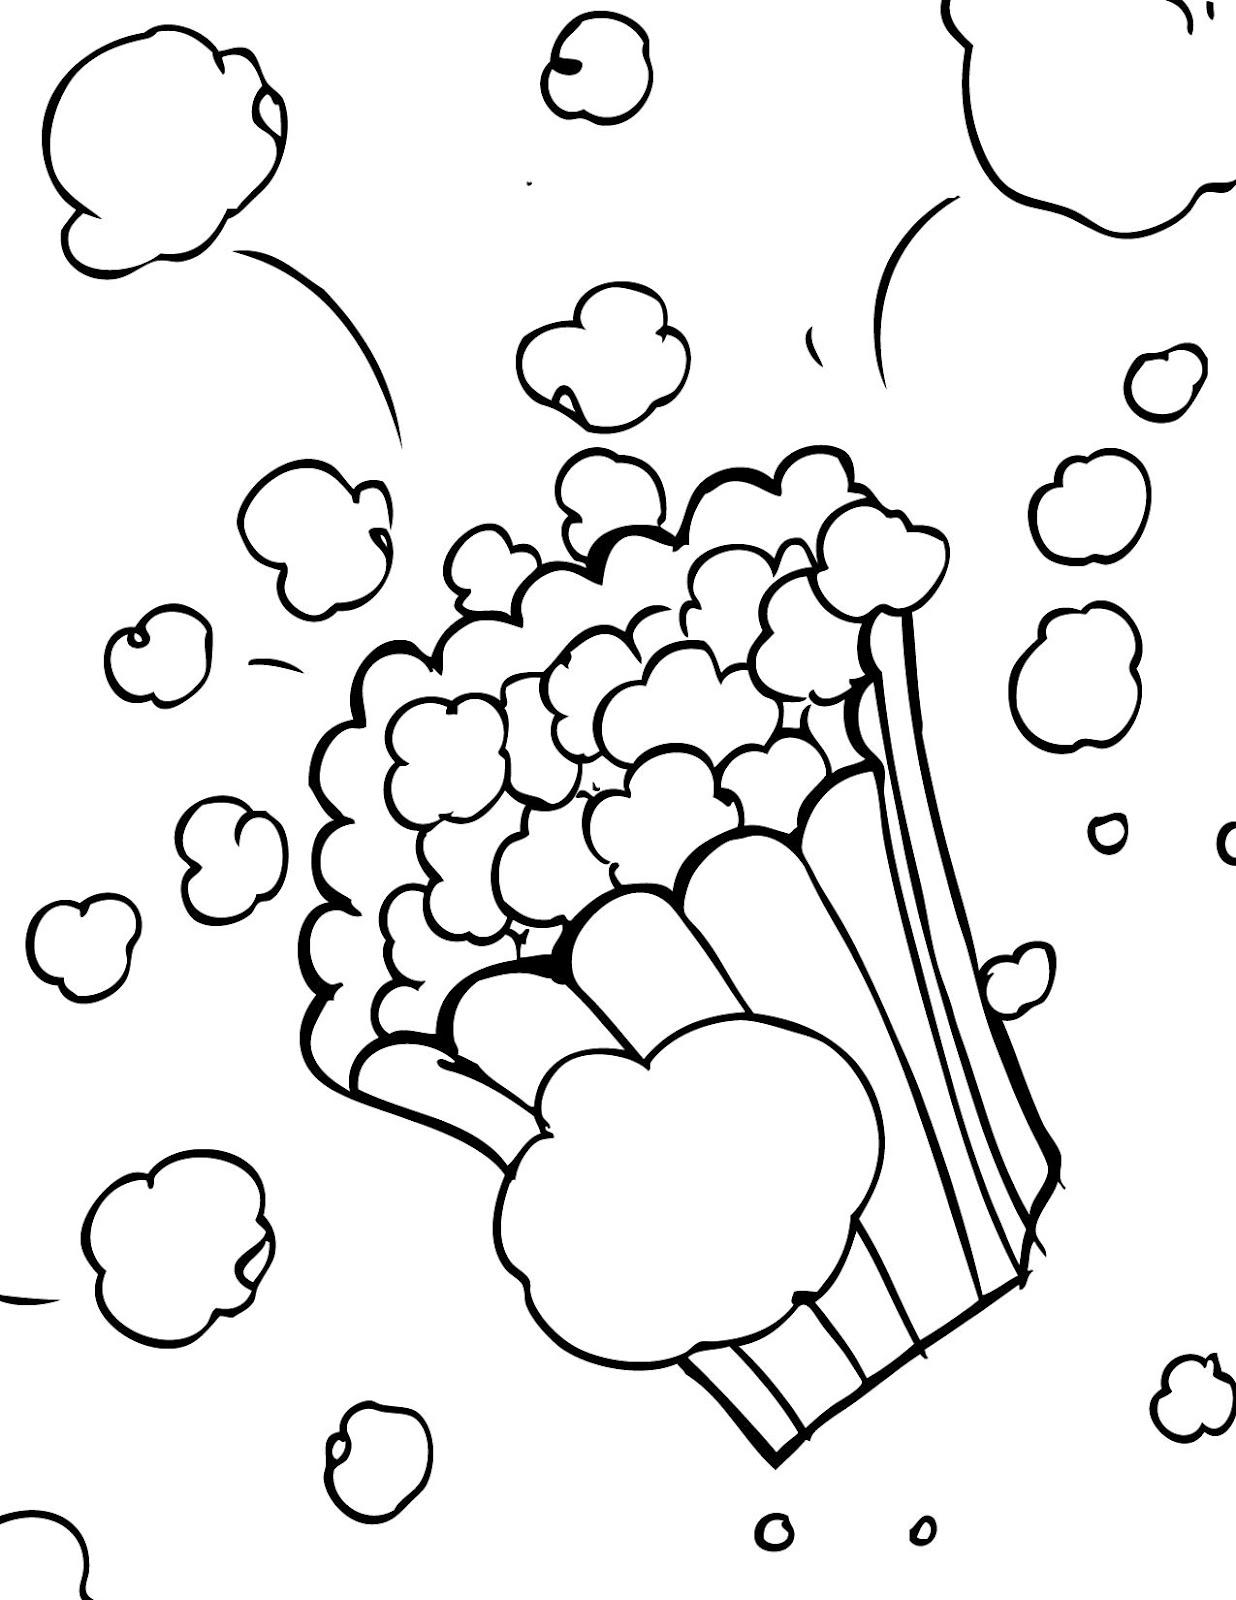 1236x1600 Confidential Popcorn Coloring Sheet Bucket Page